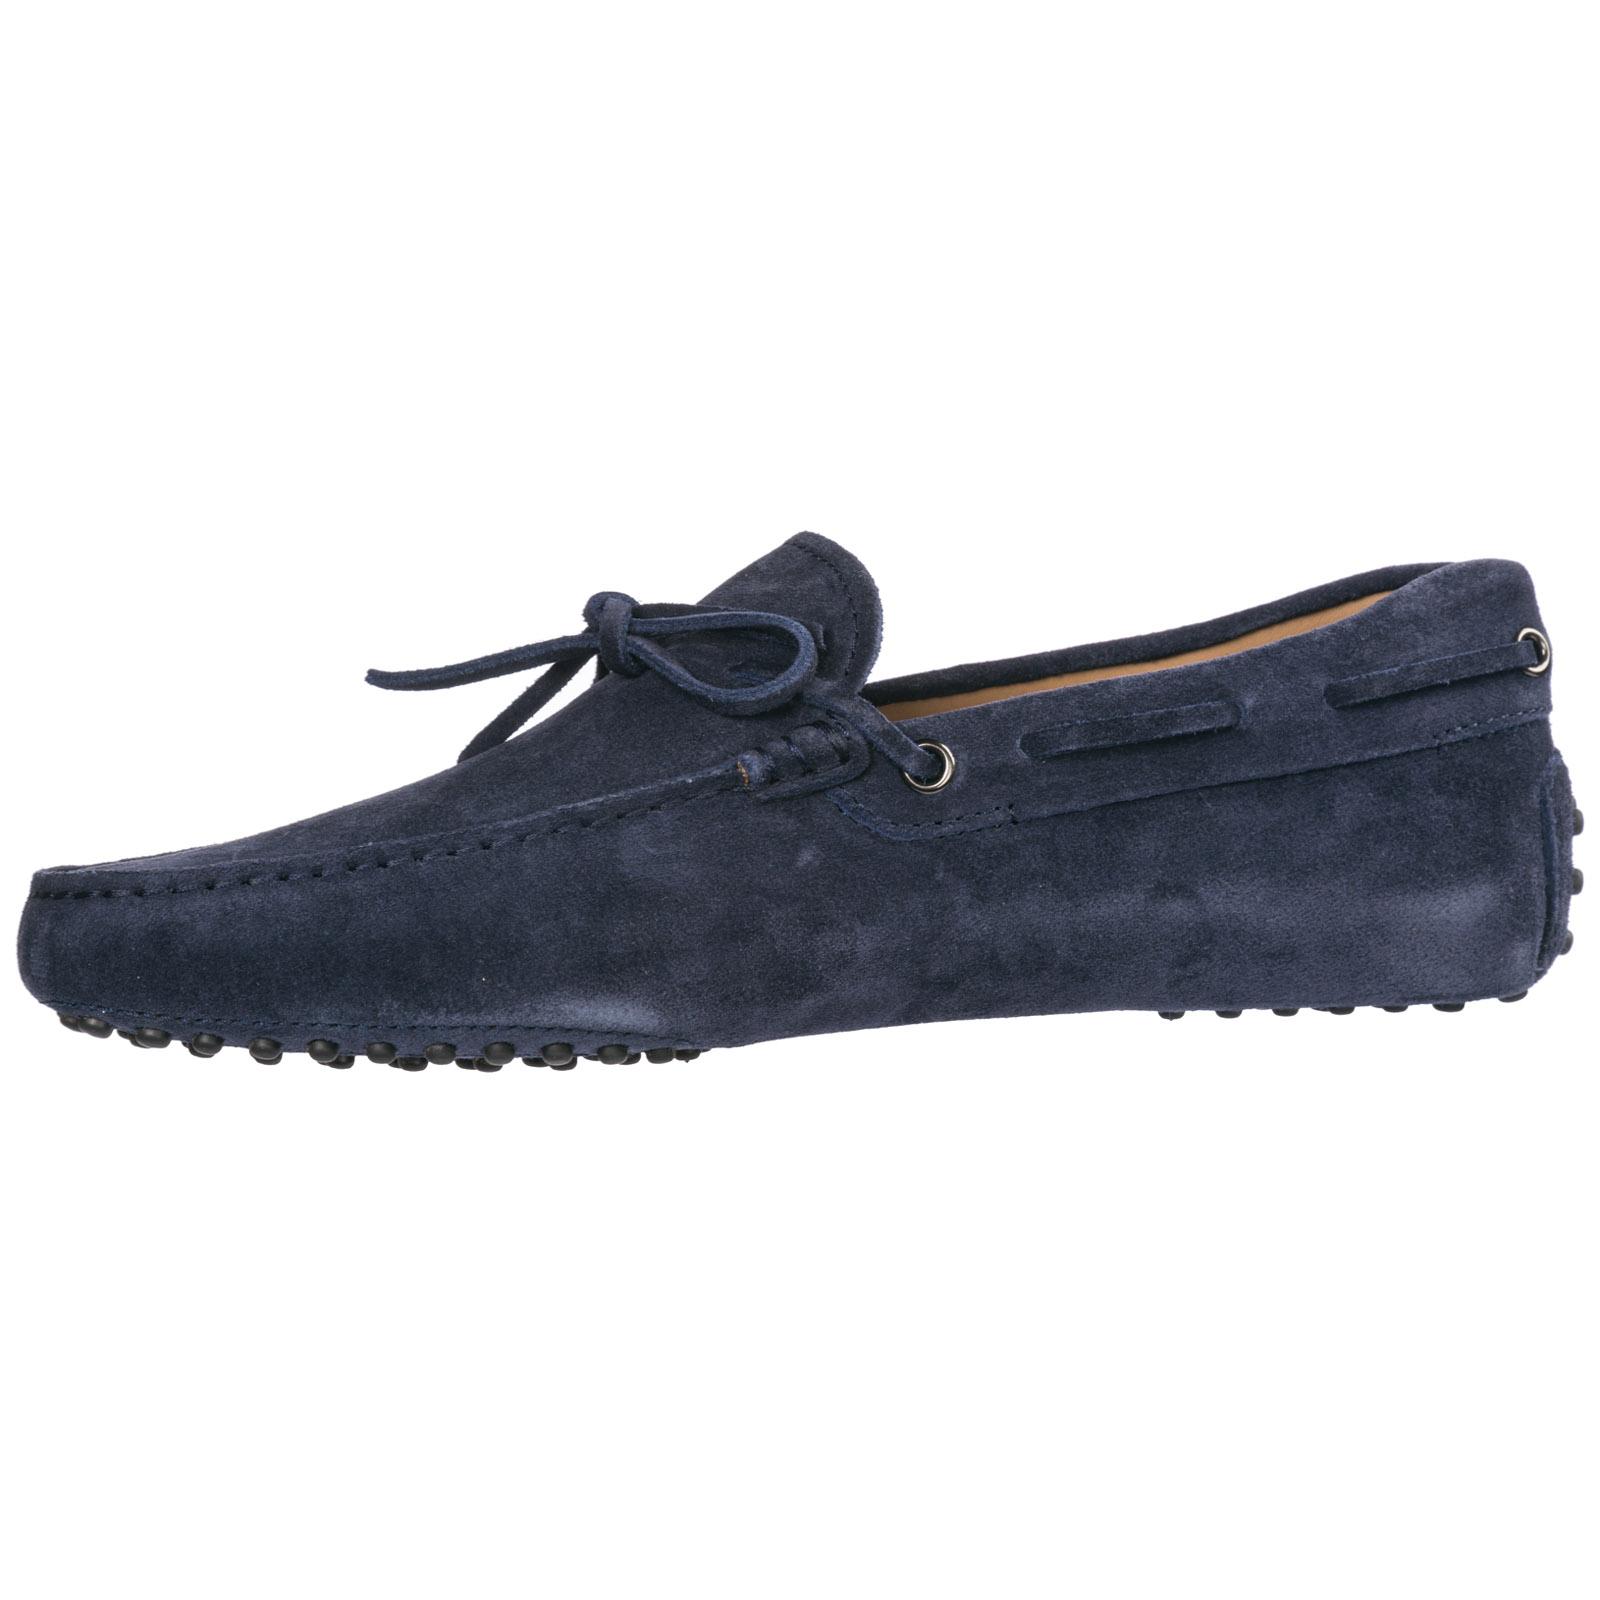 Men's suede loafers moccasins gommini laccetto new gommini